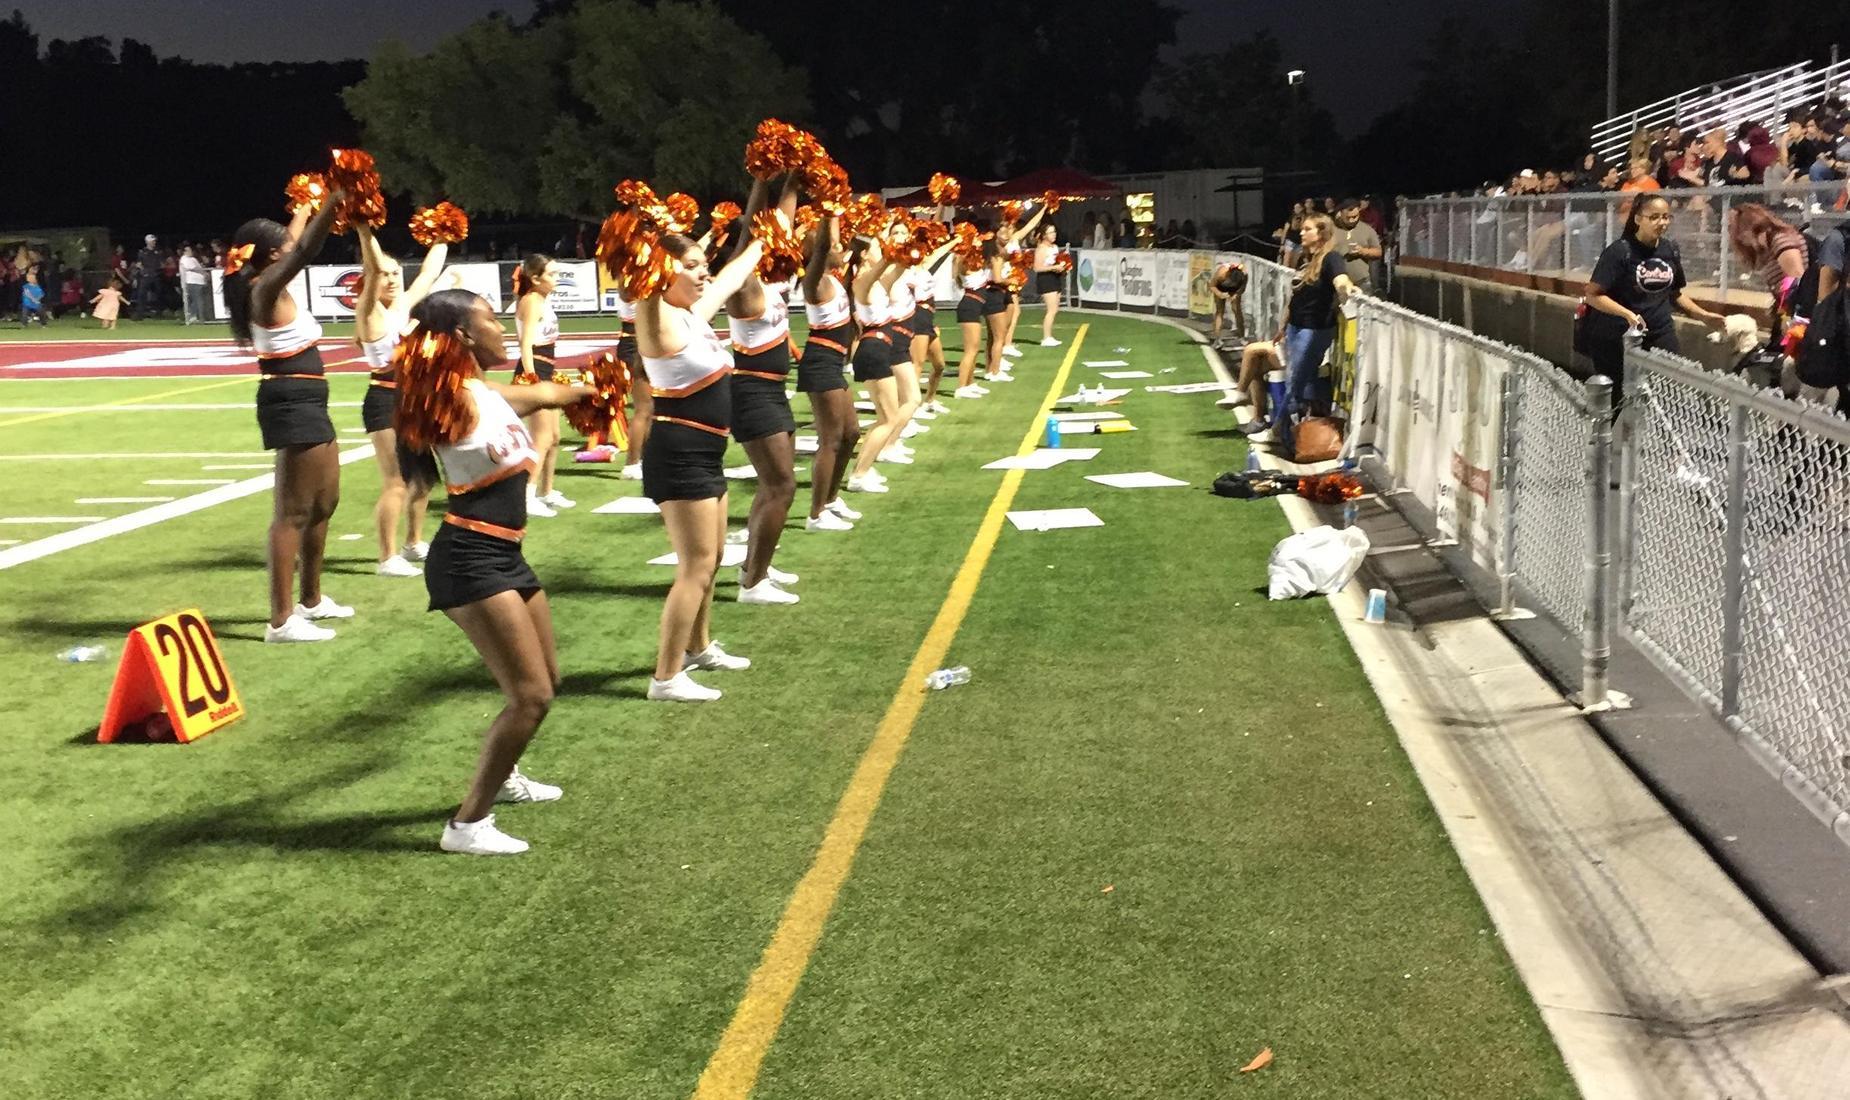 Central High School Cheerleading Team